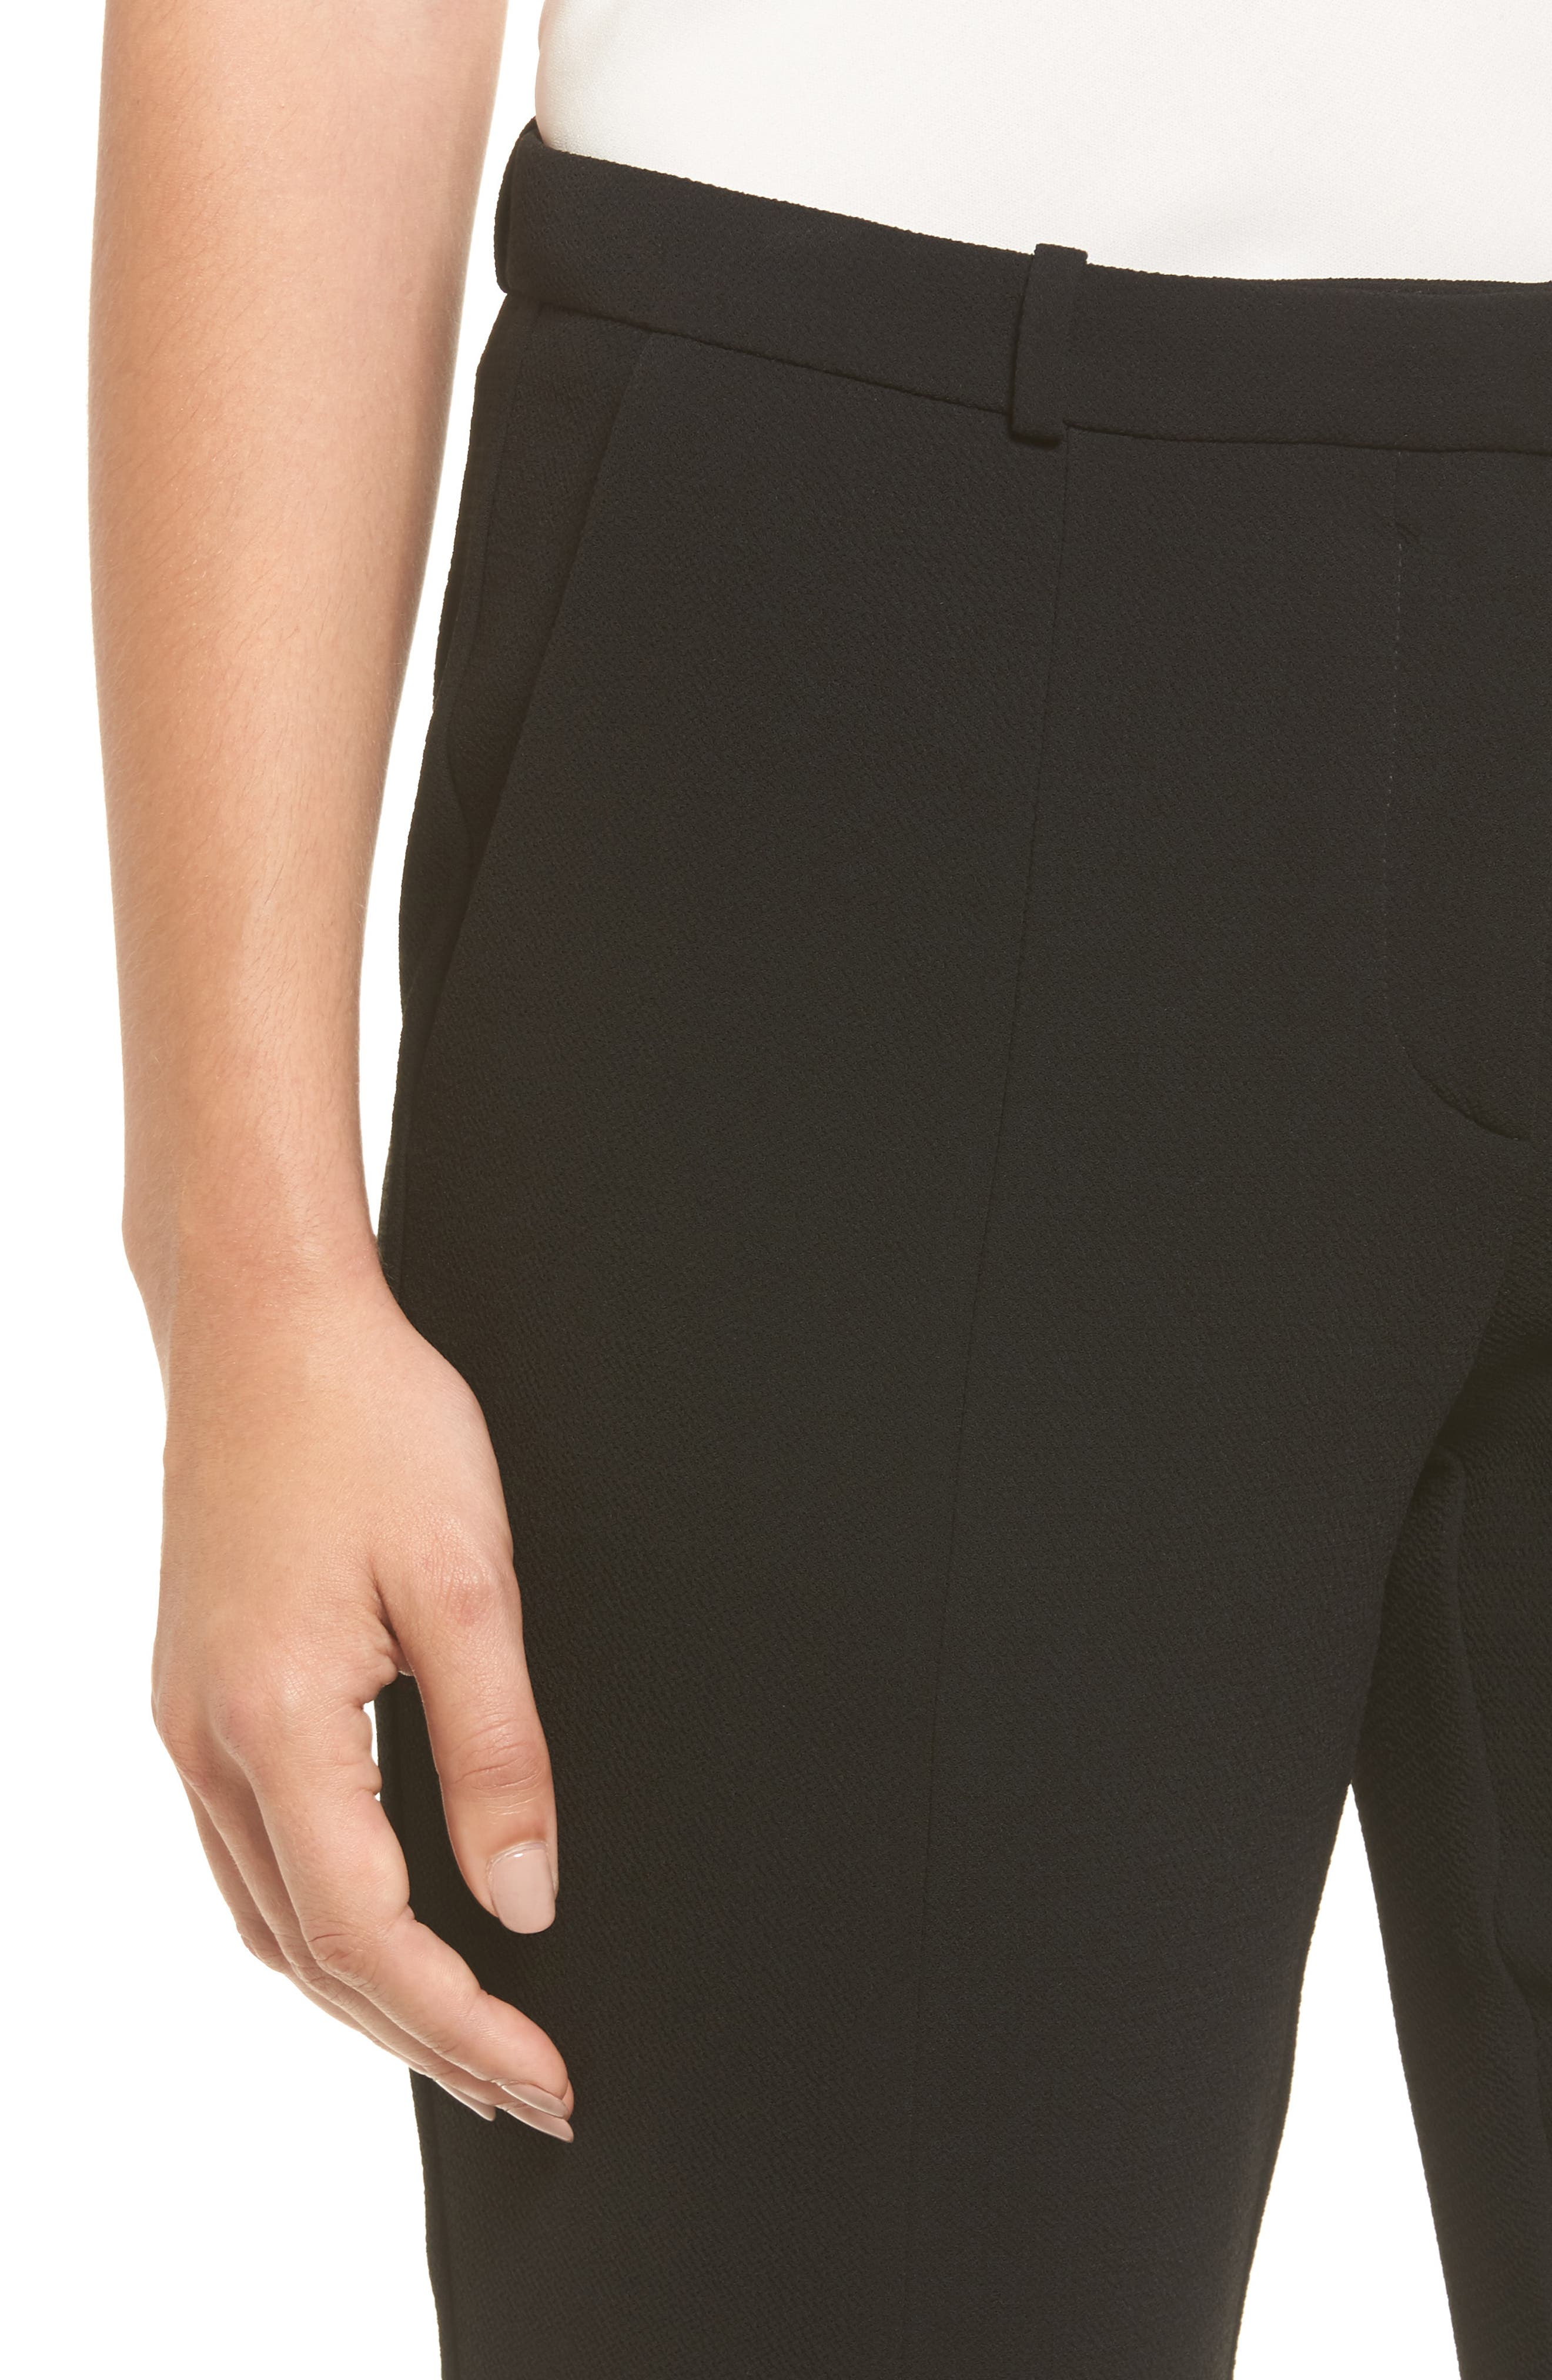 Atestelito Slim Crepe Suit Pants,                             Alternate thumbnail 4, color,                             Black